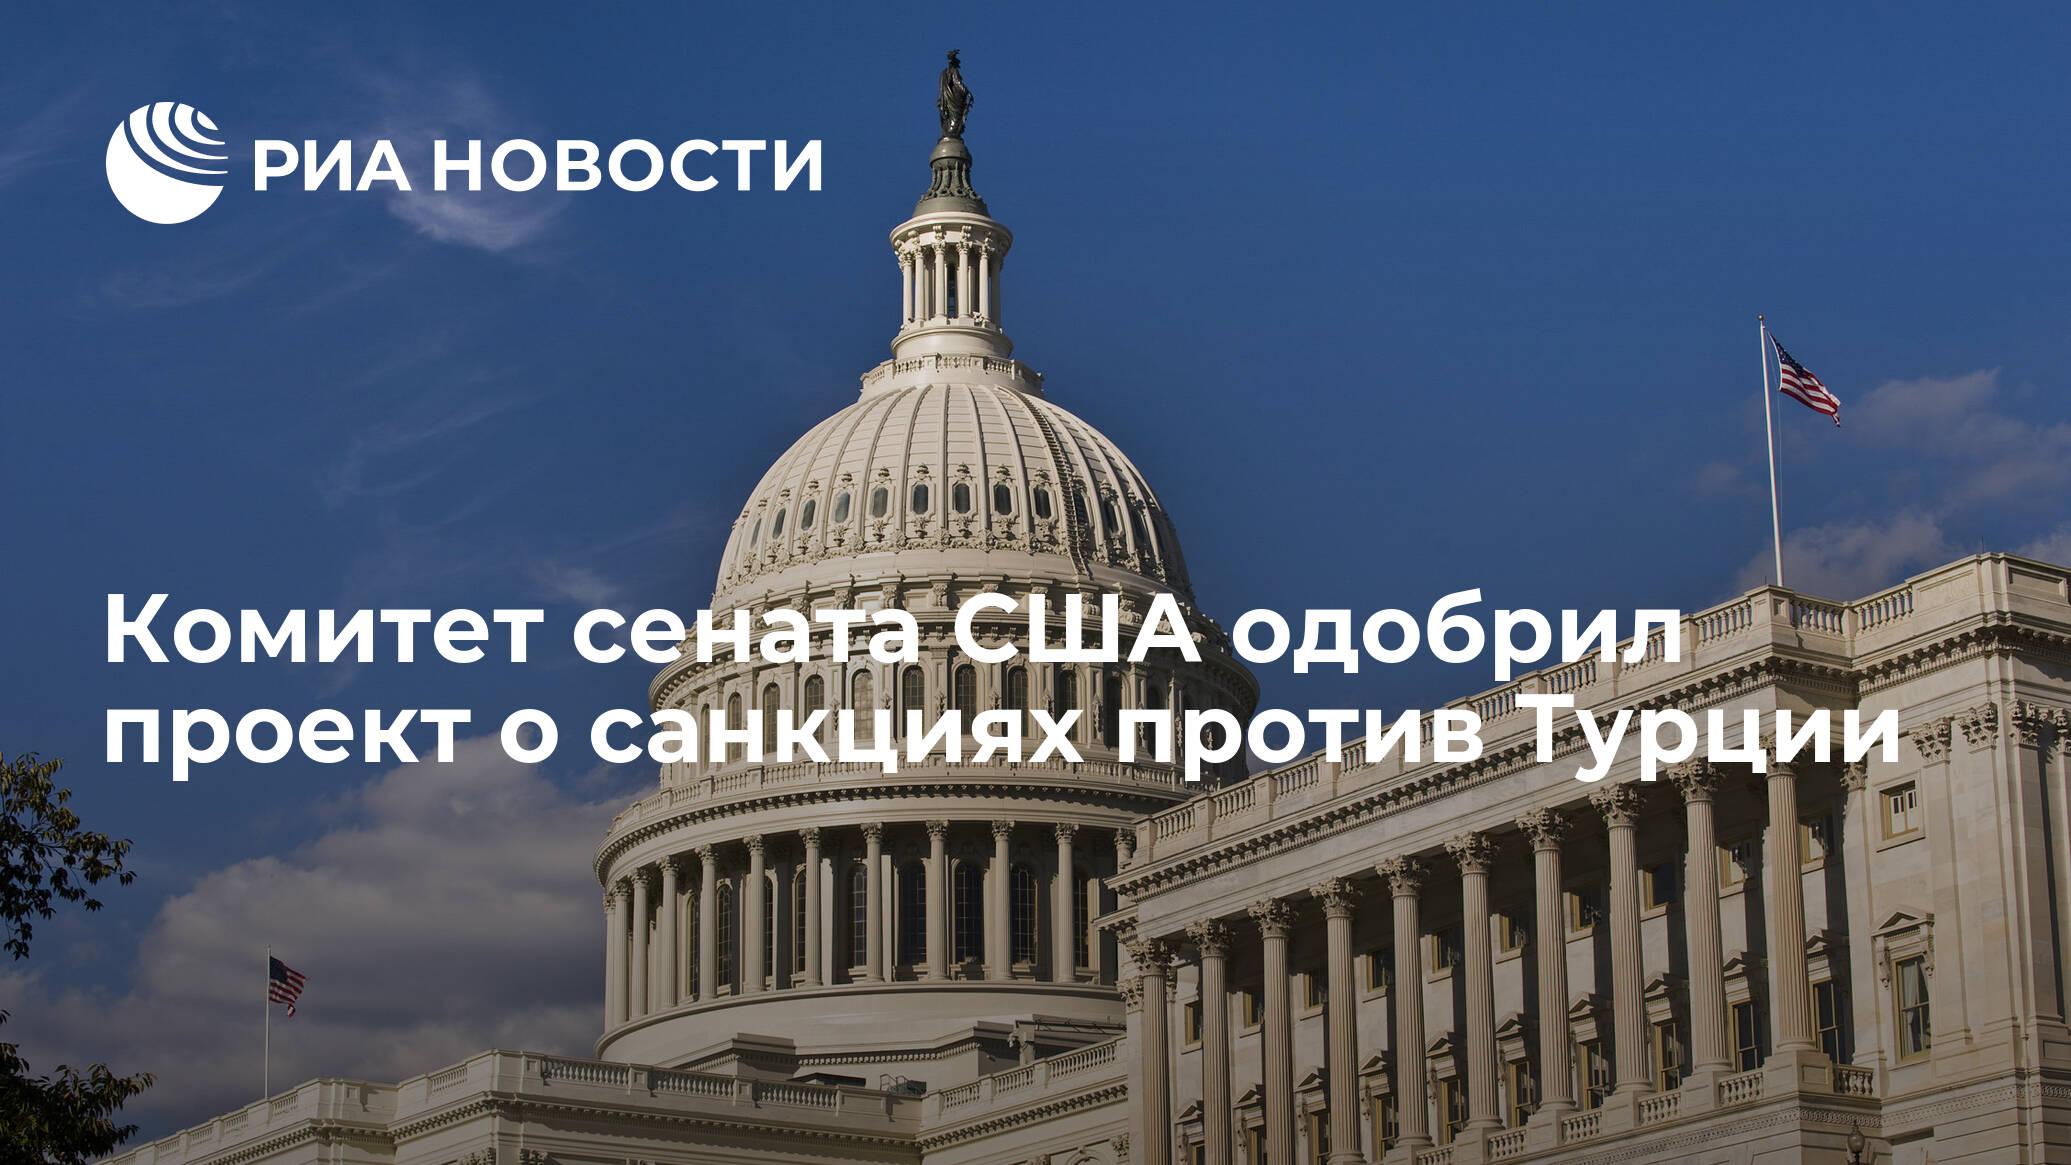 Комитет сената одобрил санкции против Турции, затрагивающие россиян